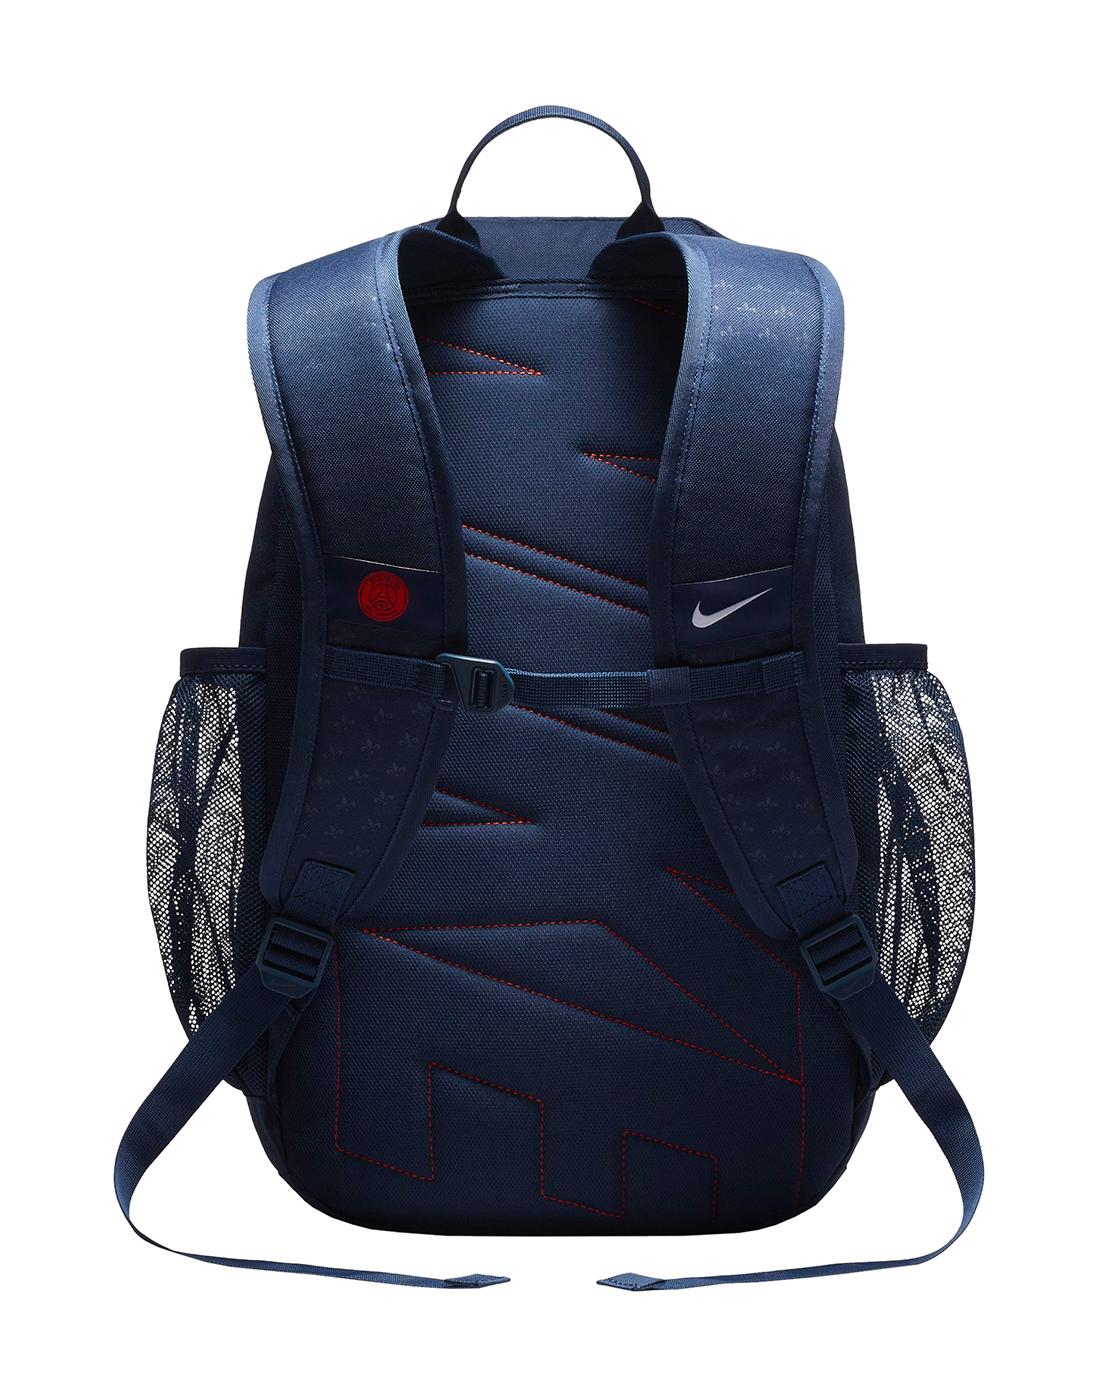 Psg Backpack · Psg Backpack · Psg Backpack 2a7c62e5fa2d3